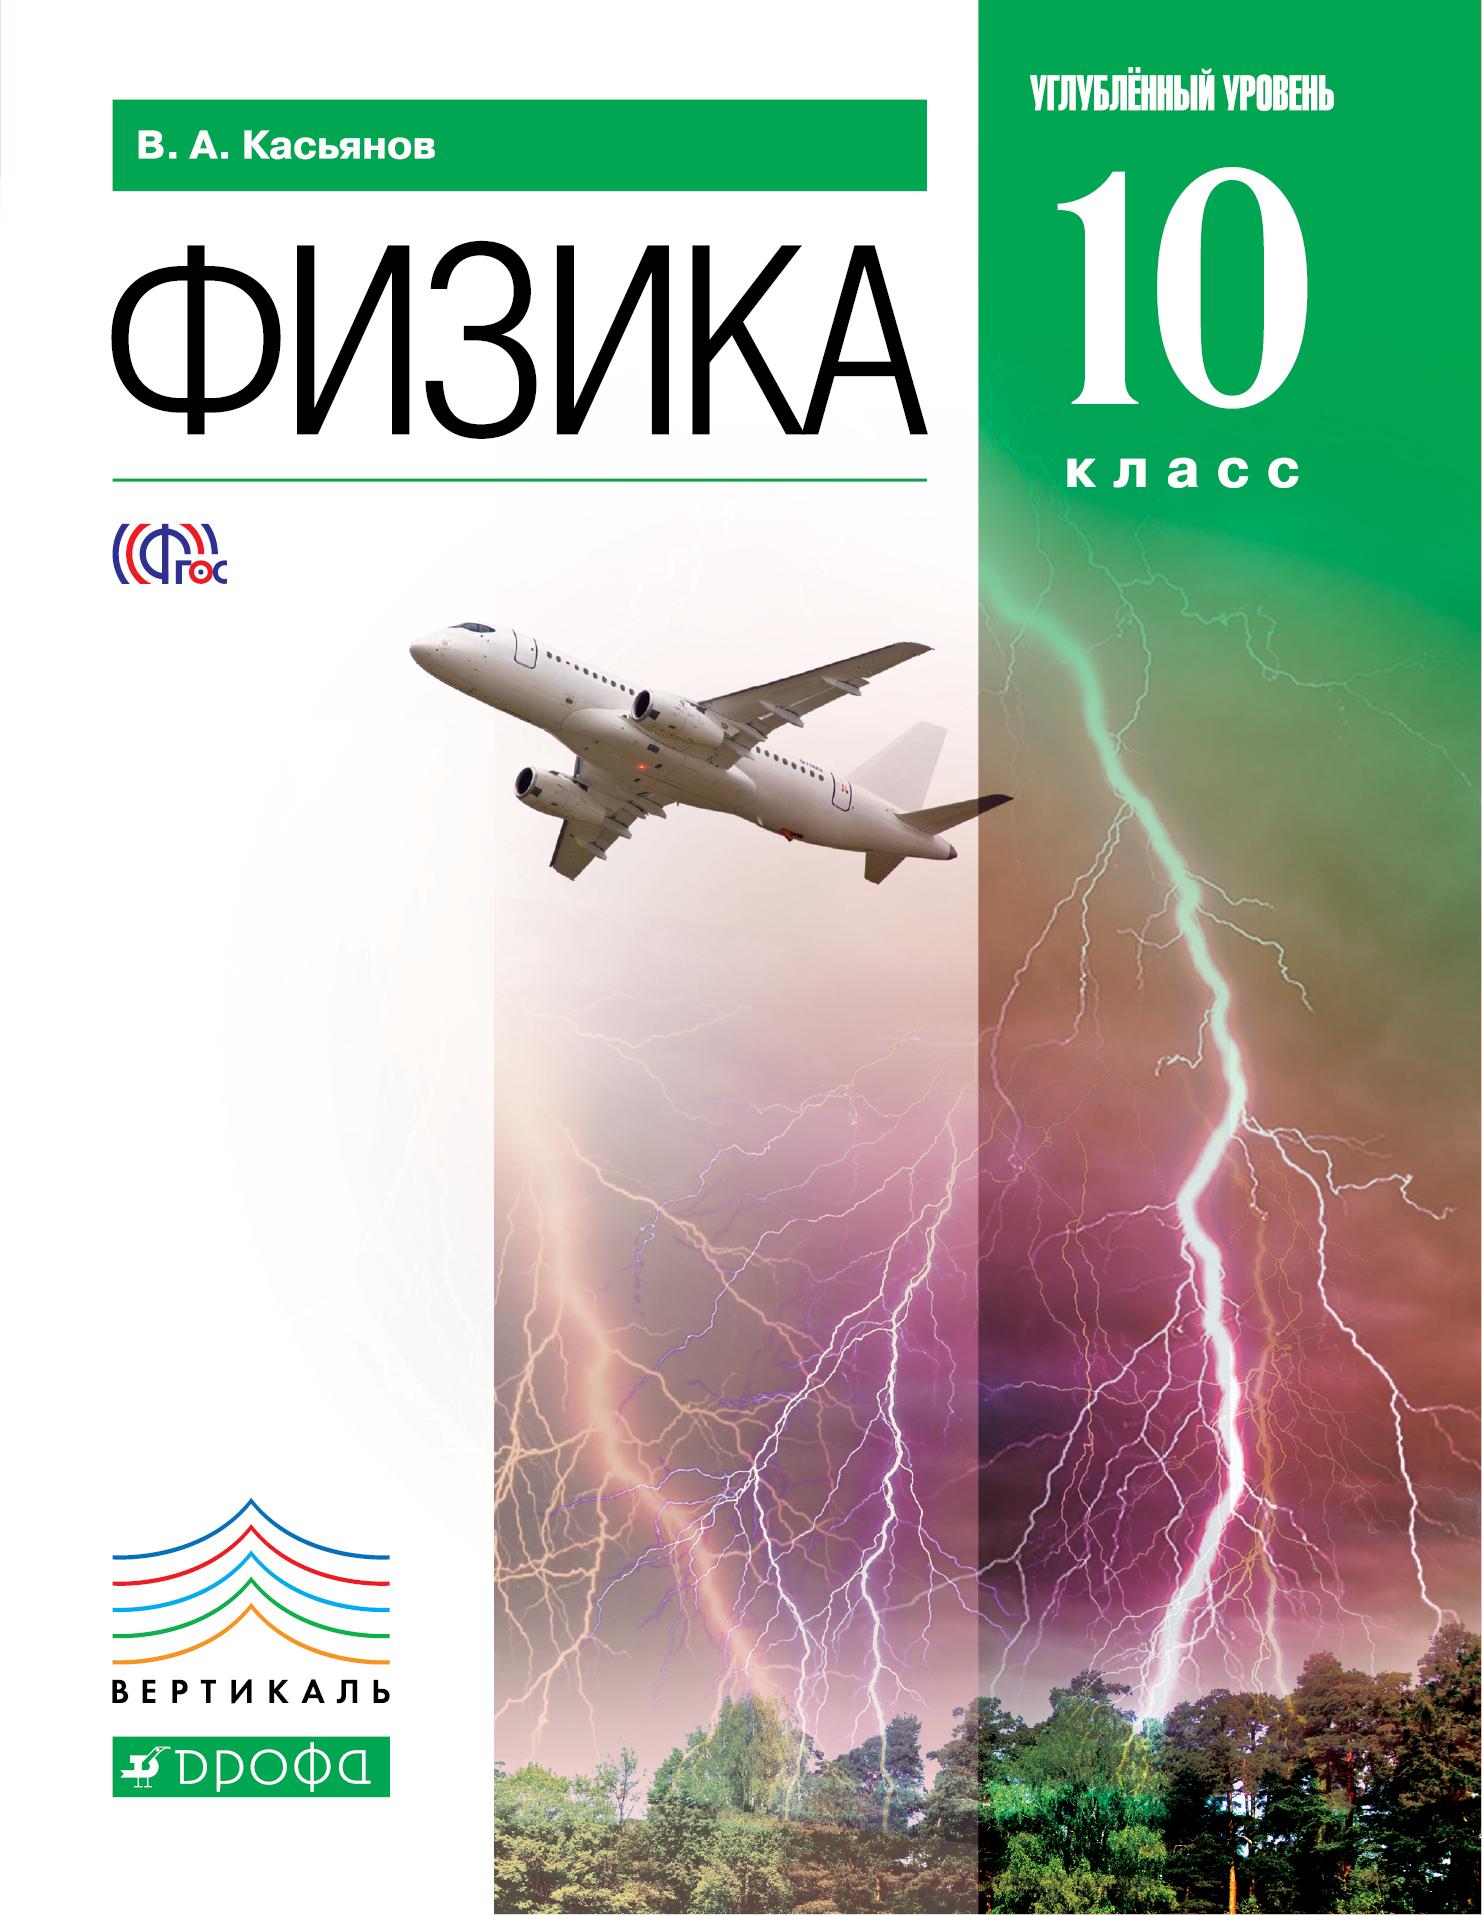 Физика 10кл [Учебник] углубл. ур. Вертикаль ФП